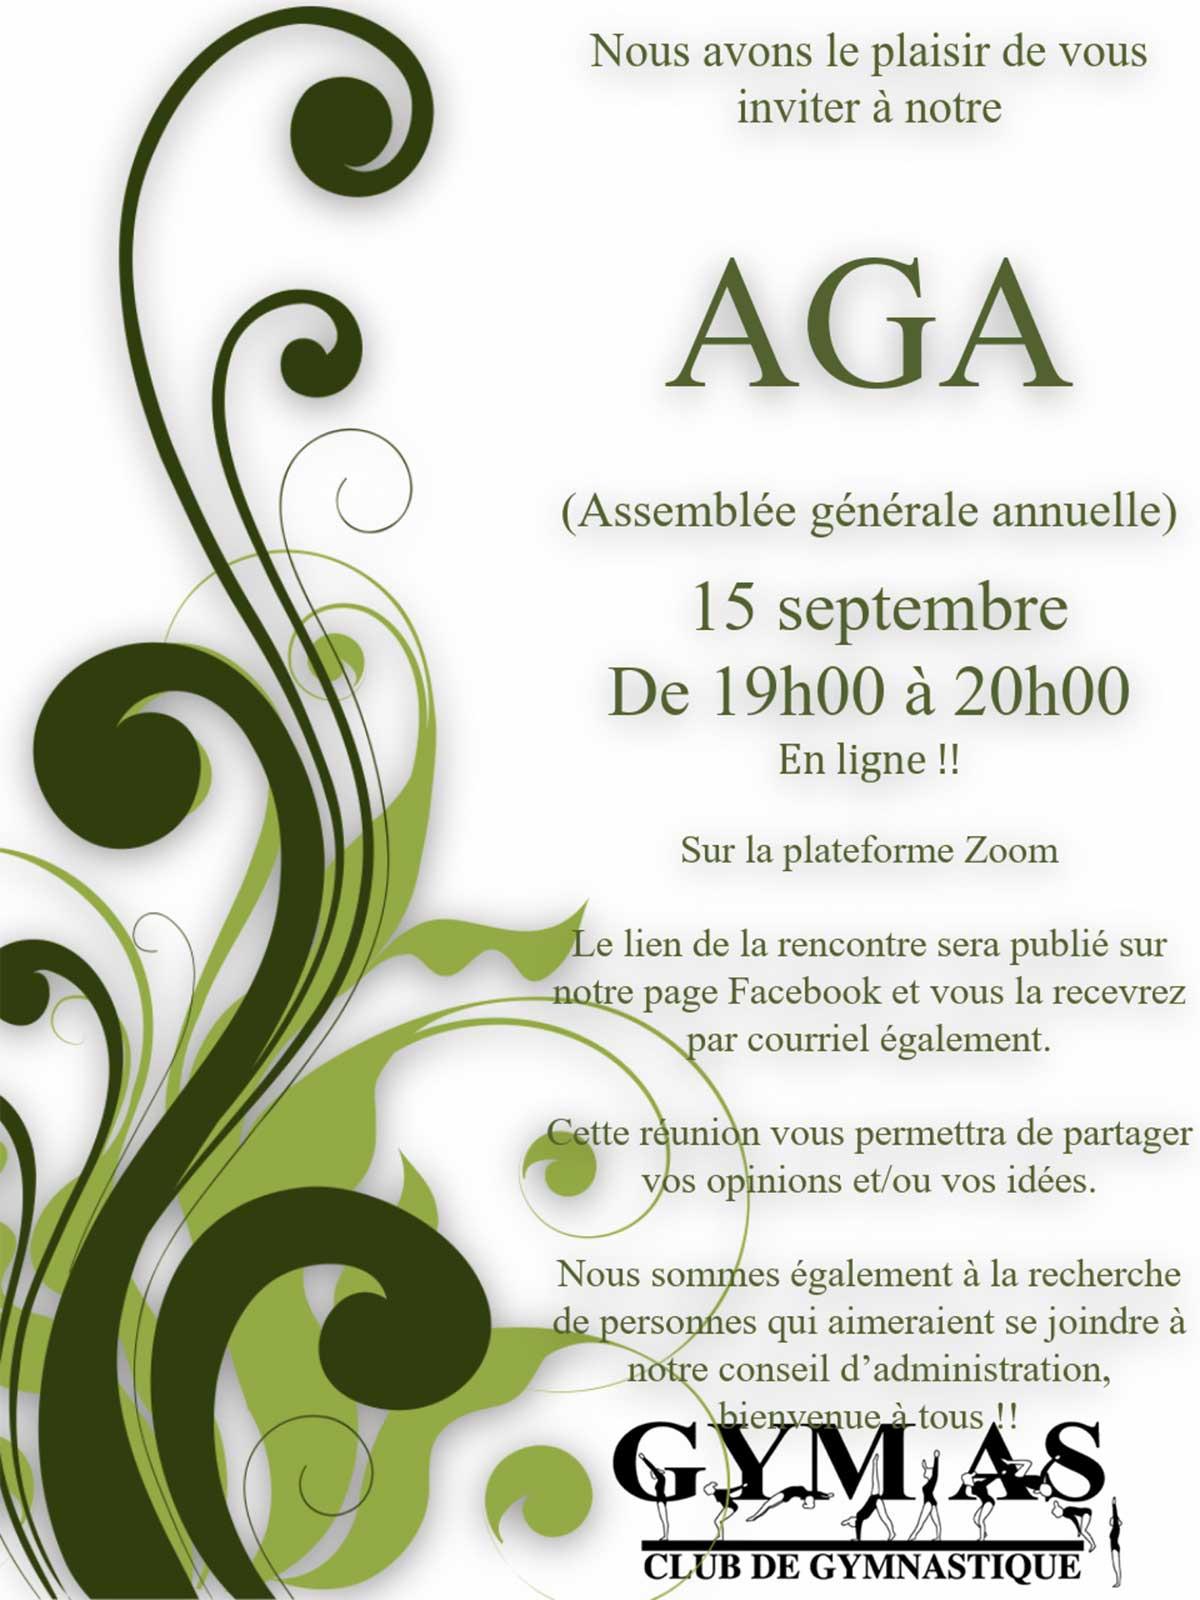 AGA-Gym-As-19-sept-2020-en-ligne